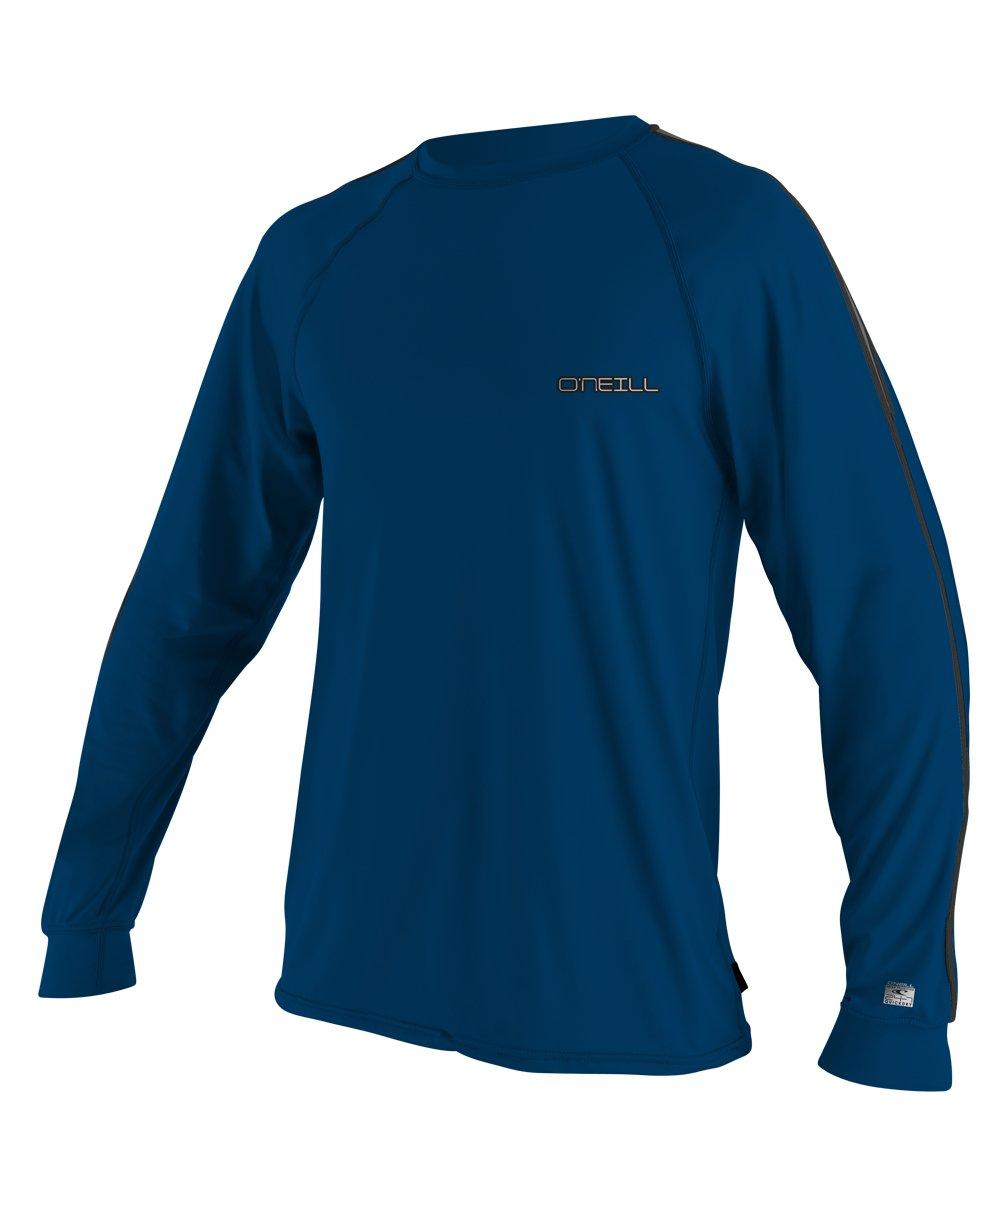 Amazon.com: O'Neill Wetsuits Men's 24-7 Tech Long Sleeve Crew Top ...